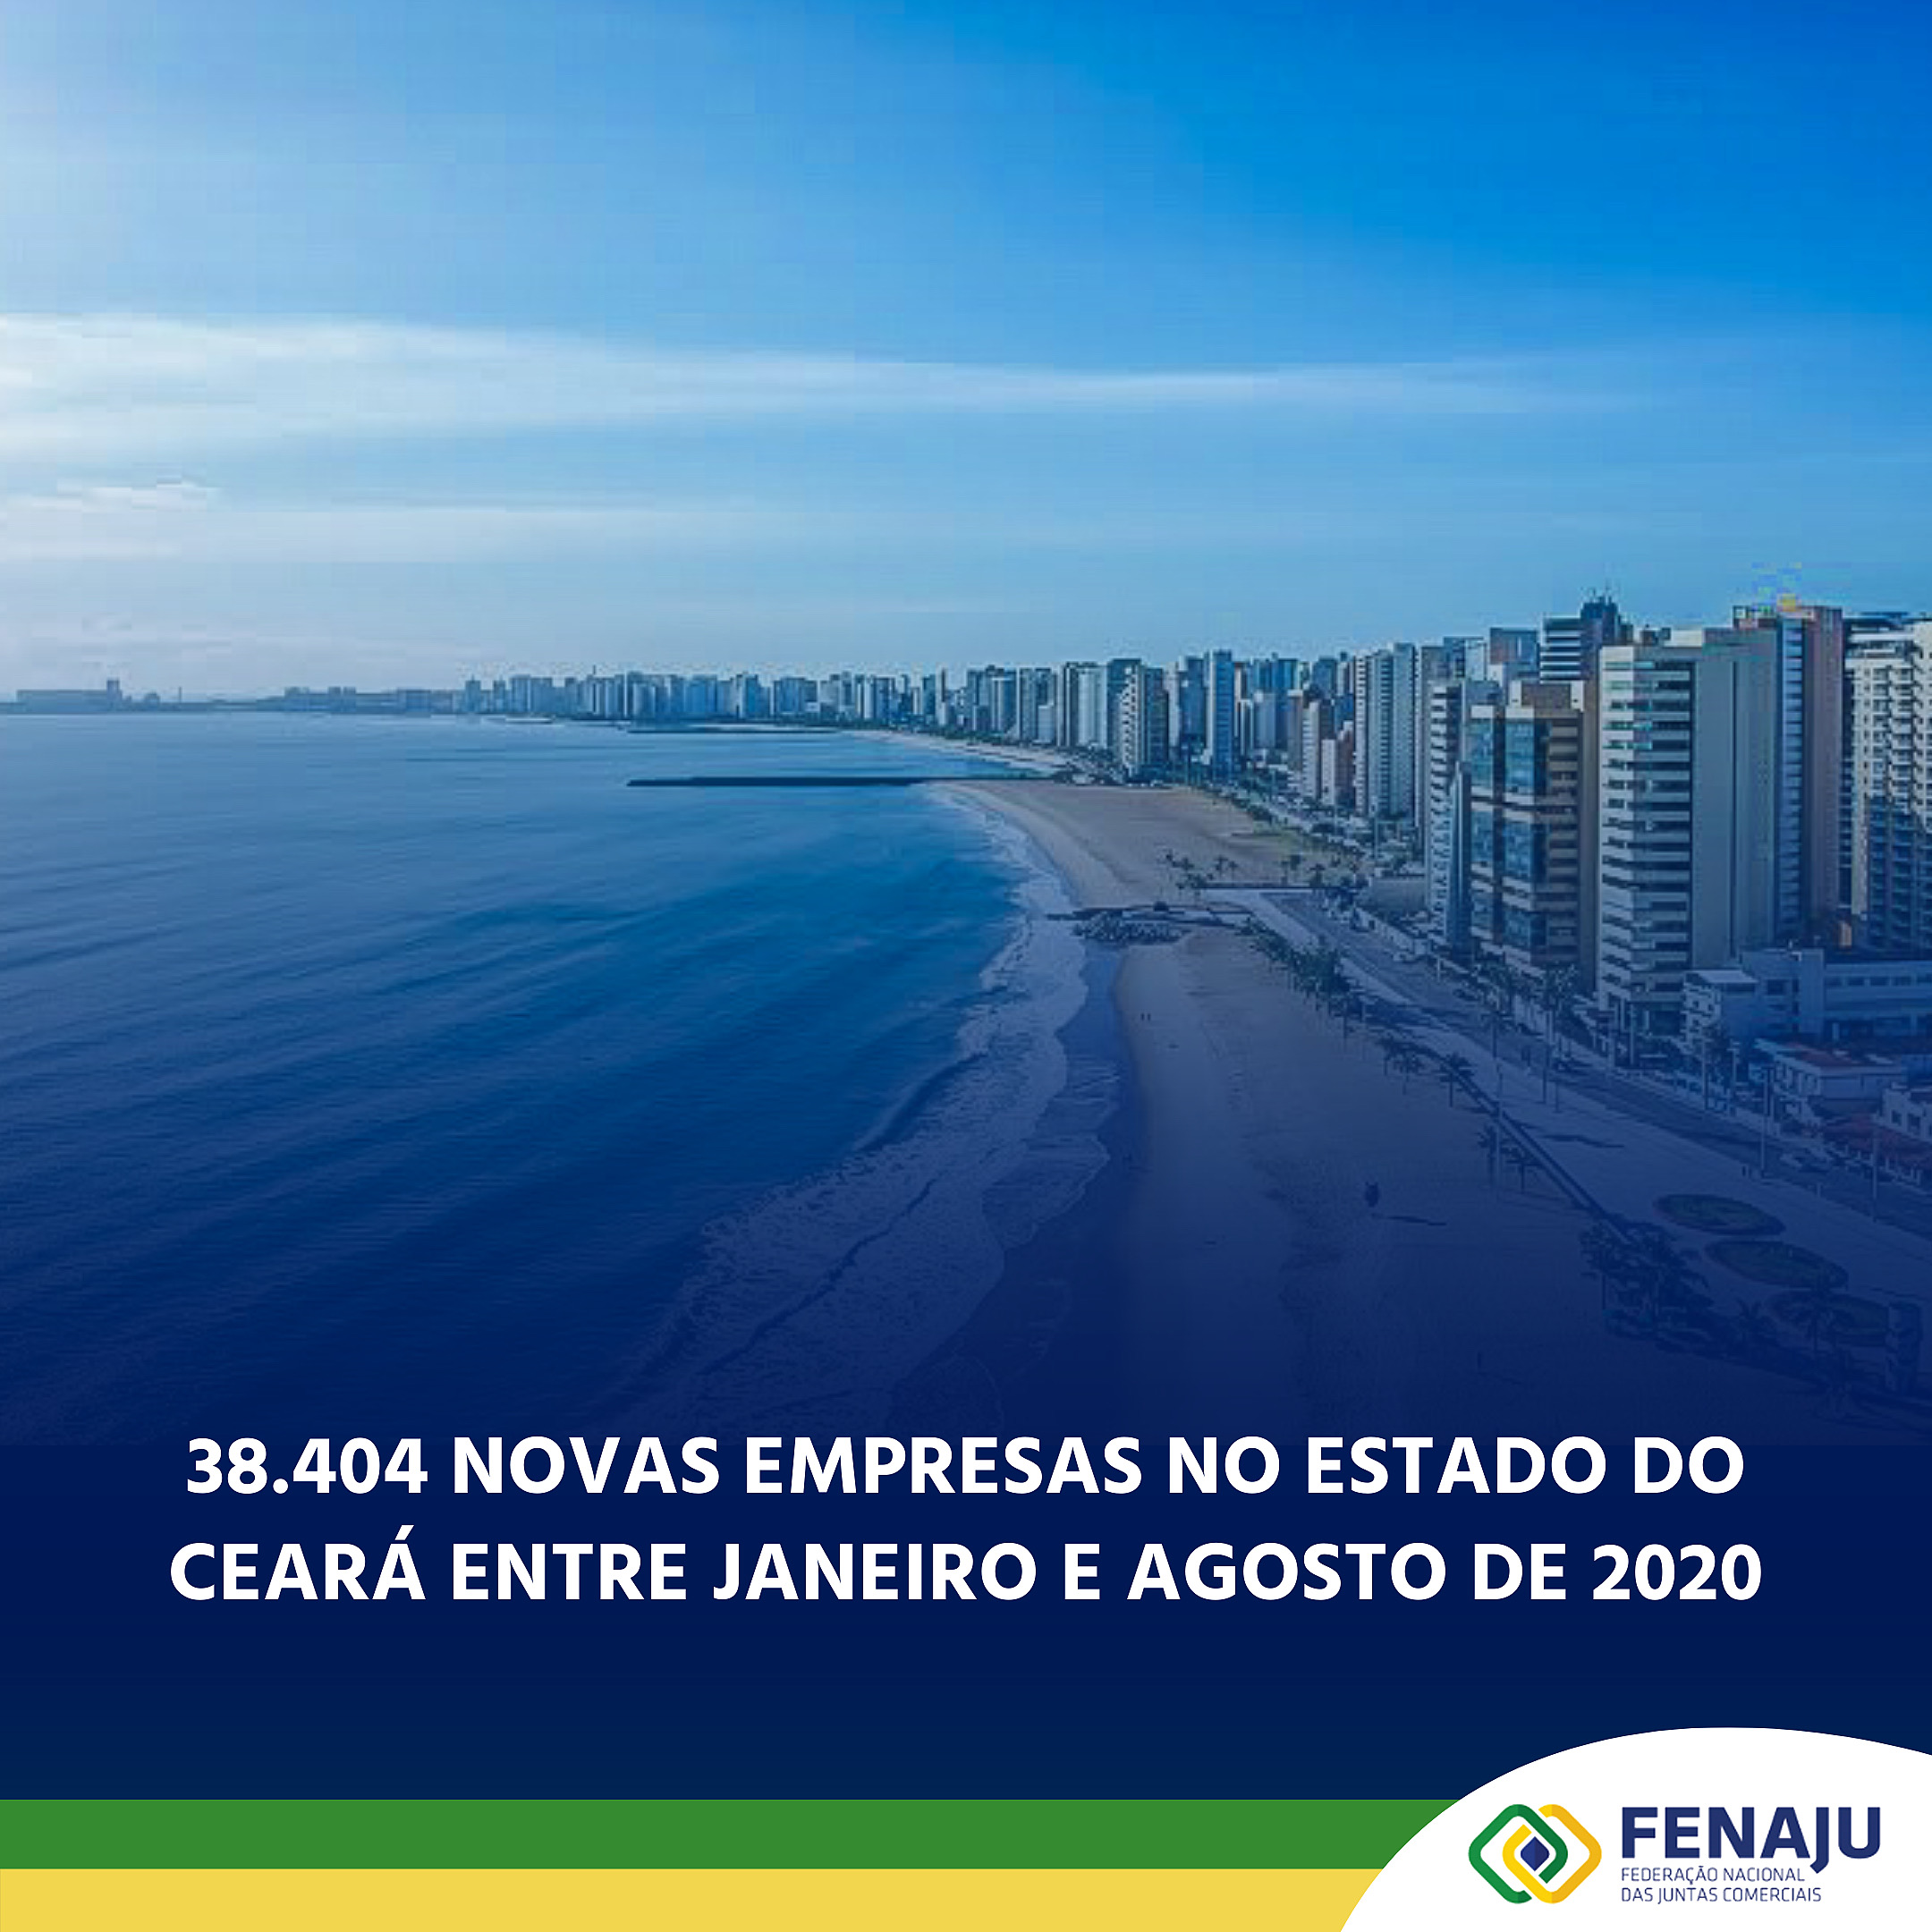 38.404 novas empresas no Ceará entre janeiro e agosto de 2020